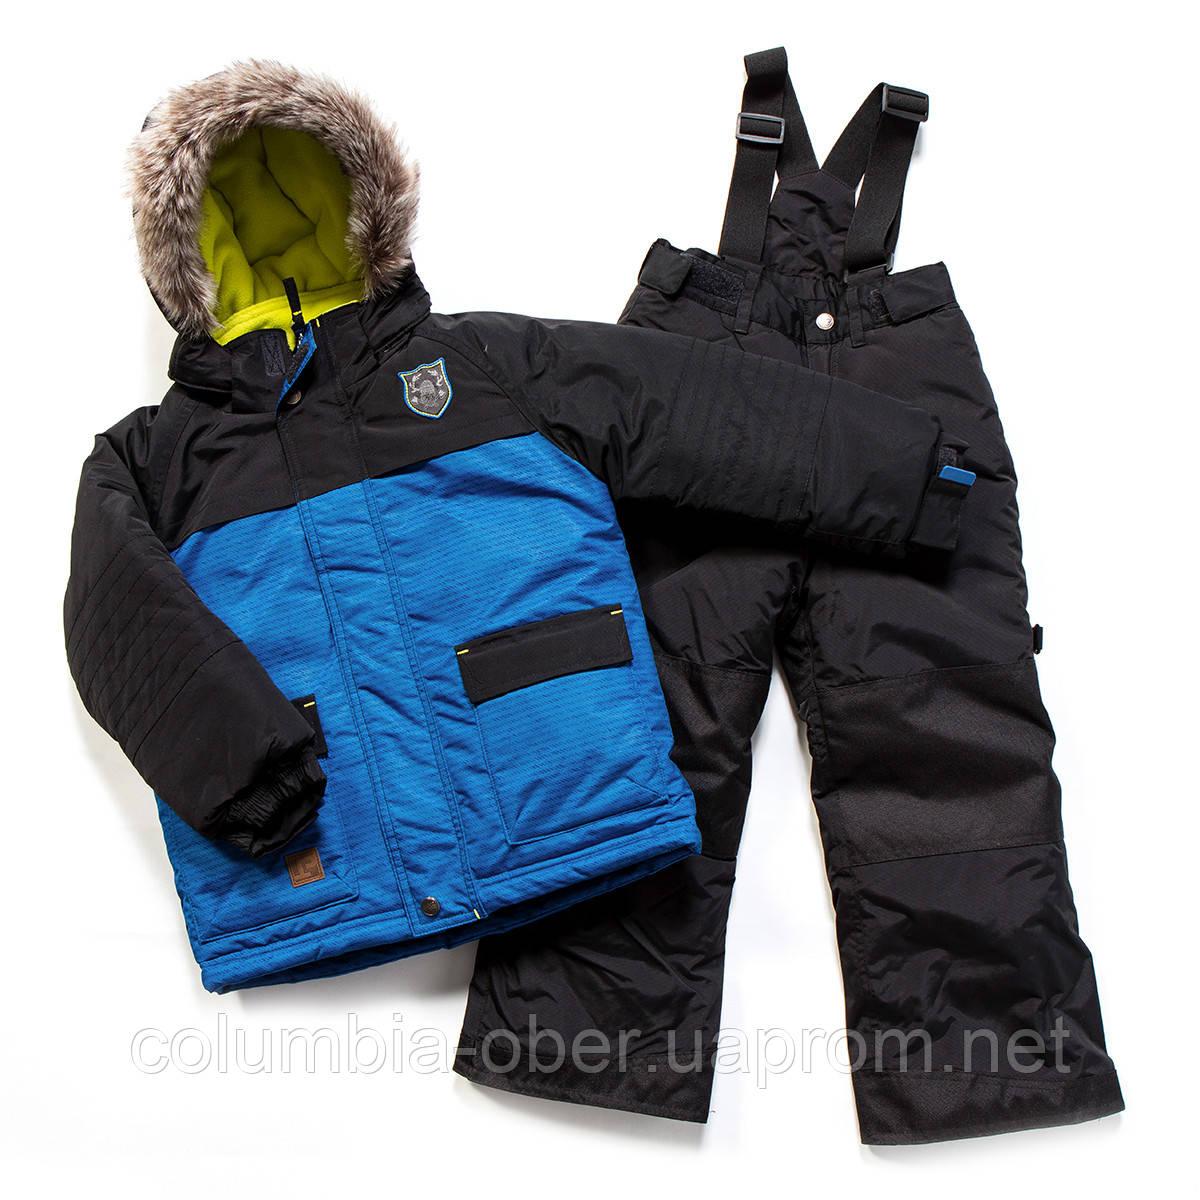 Зимний костюм для мальчика PELUCHE F17 M 51 EG Blue / Black. Размеры 104-128.